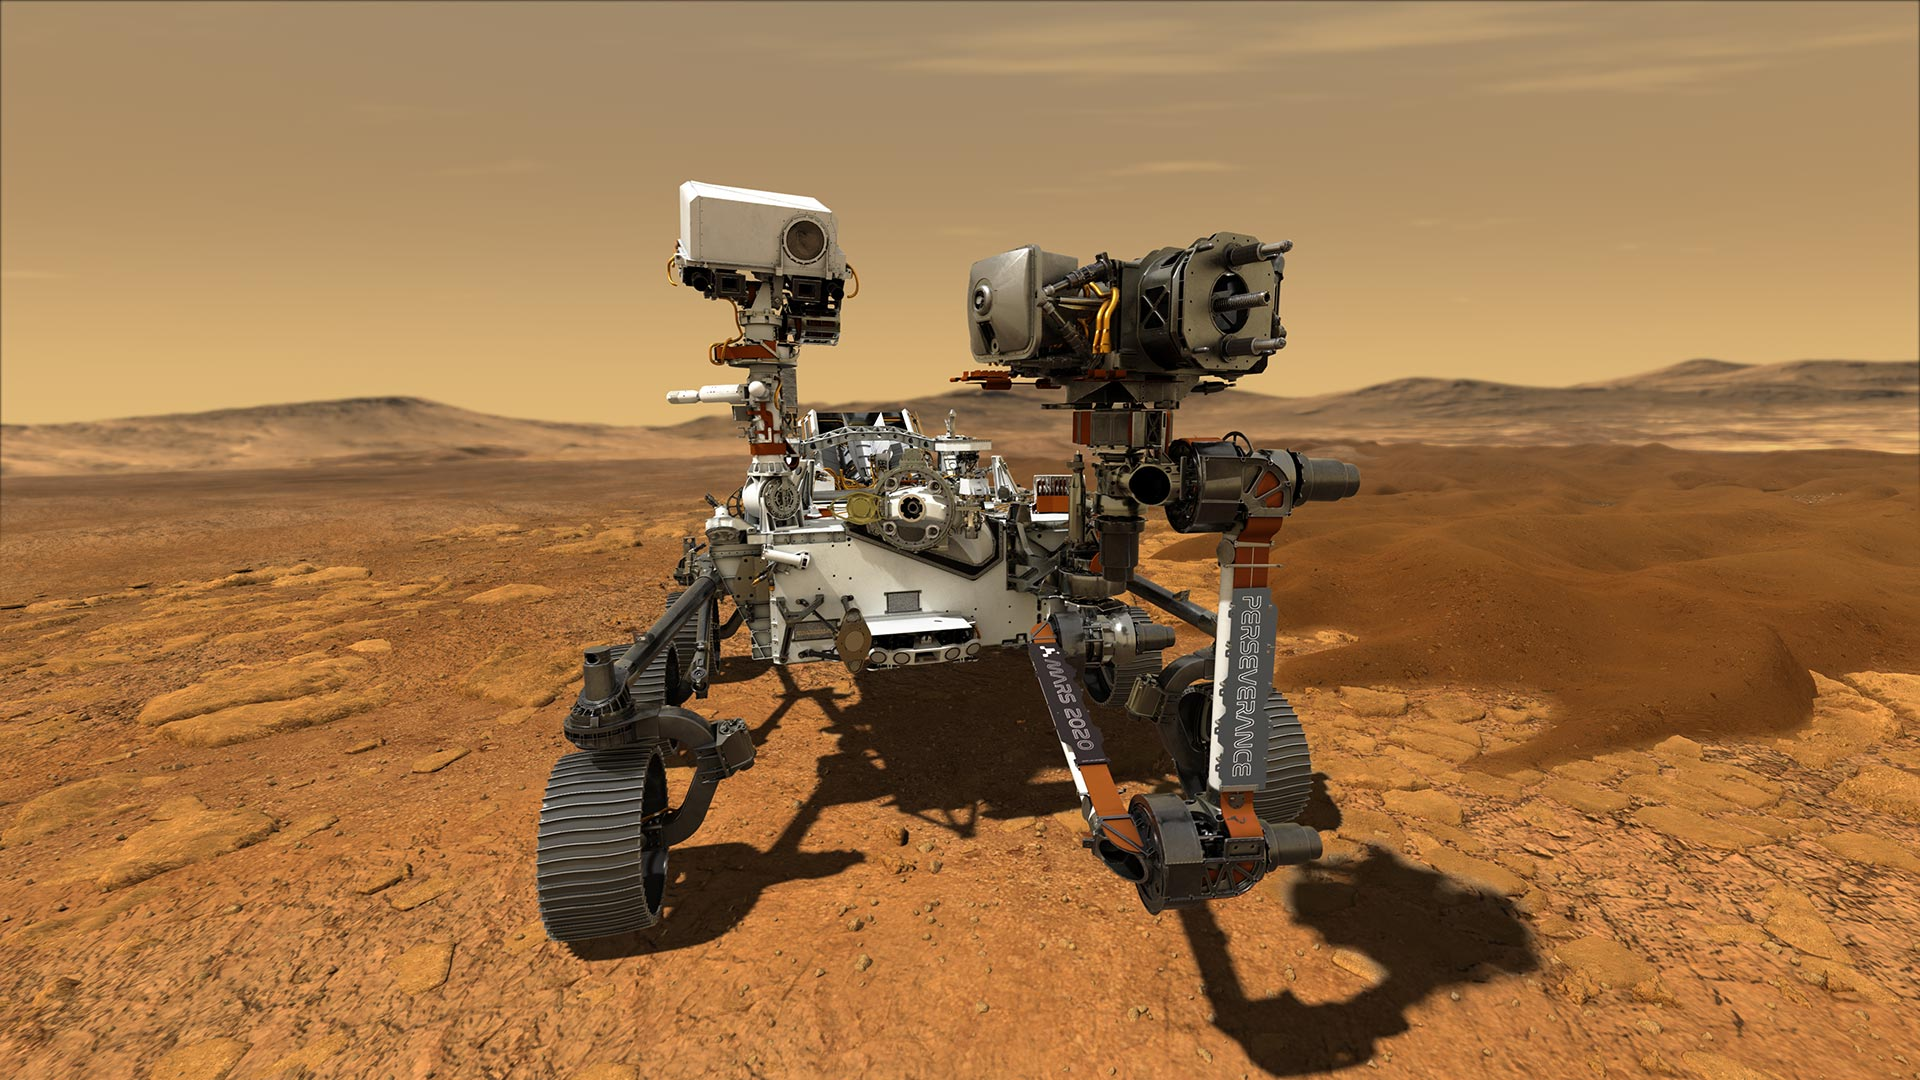 Eksperimen MOXIE NASA Membuat Oksigen di Mars Bagian 2